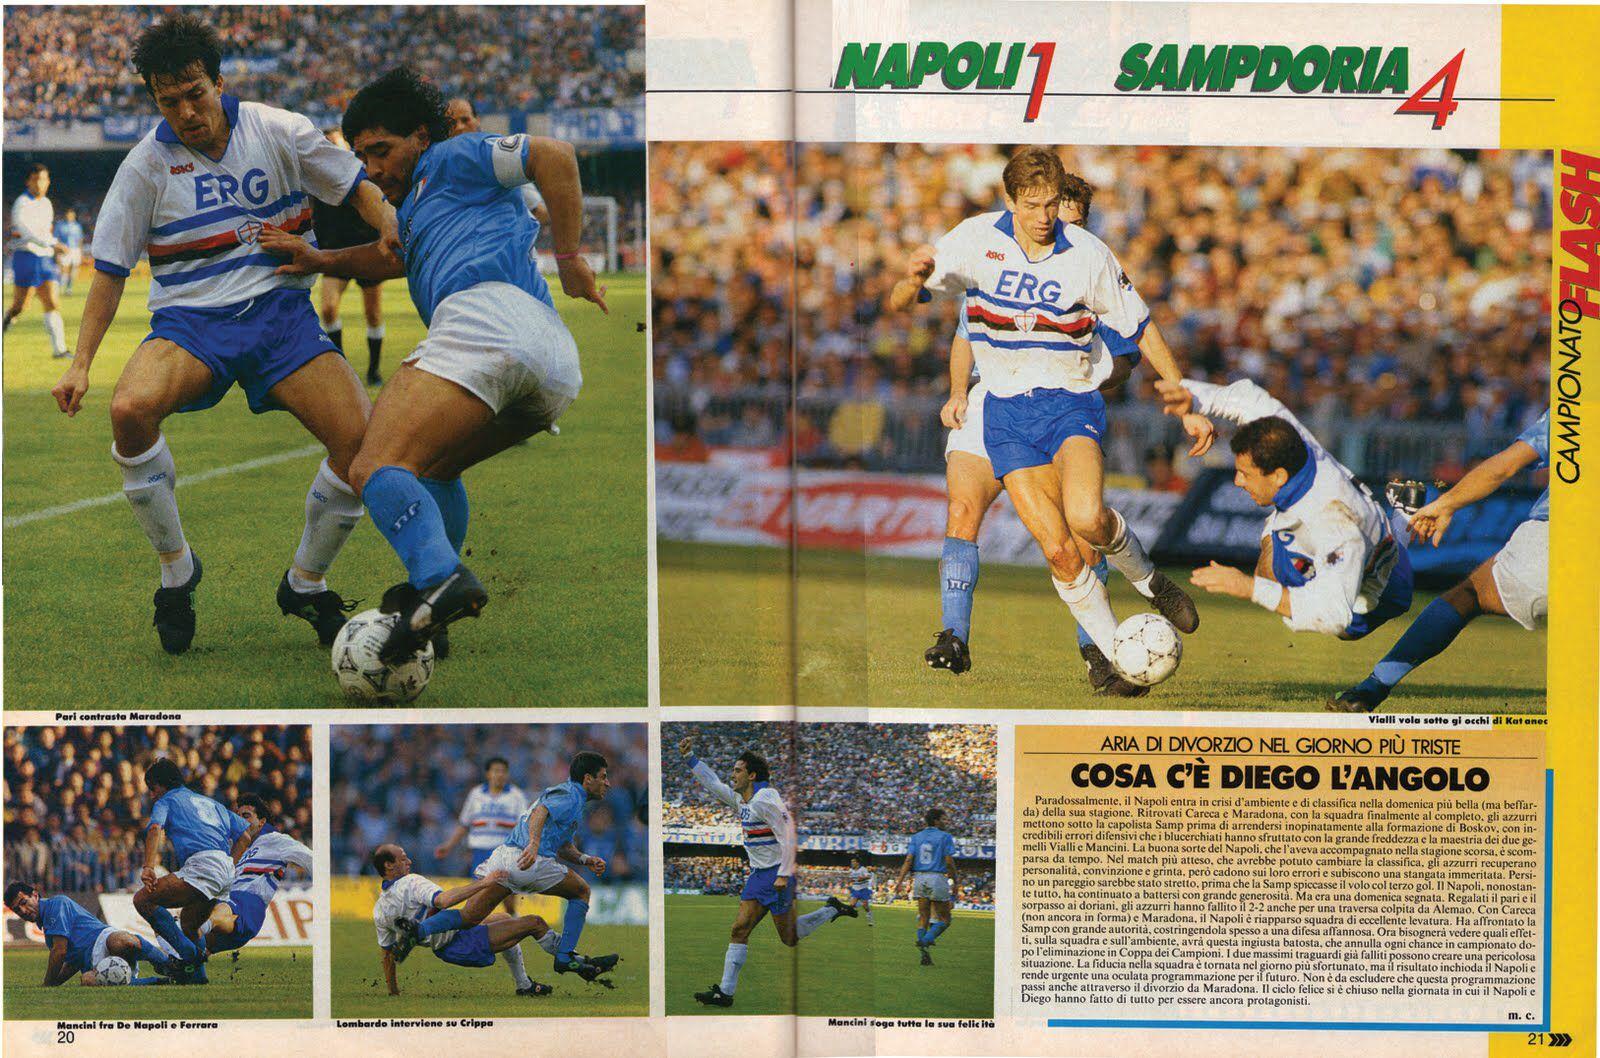 Napoli 1 Sampdoria 4 In Nov 1990 At Stadio San Paolo Action From Serie A And A Brilliant Result For Sampdoria Baseball Cards San